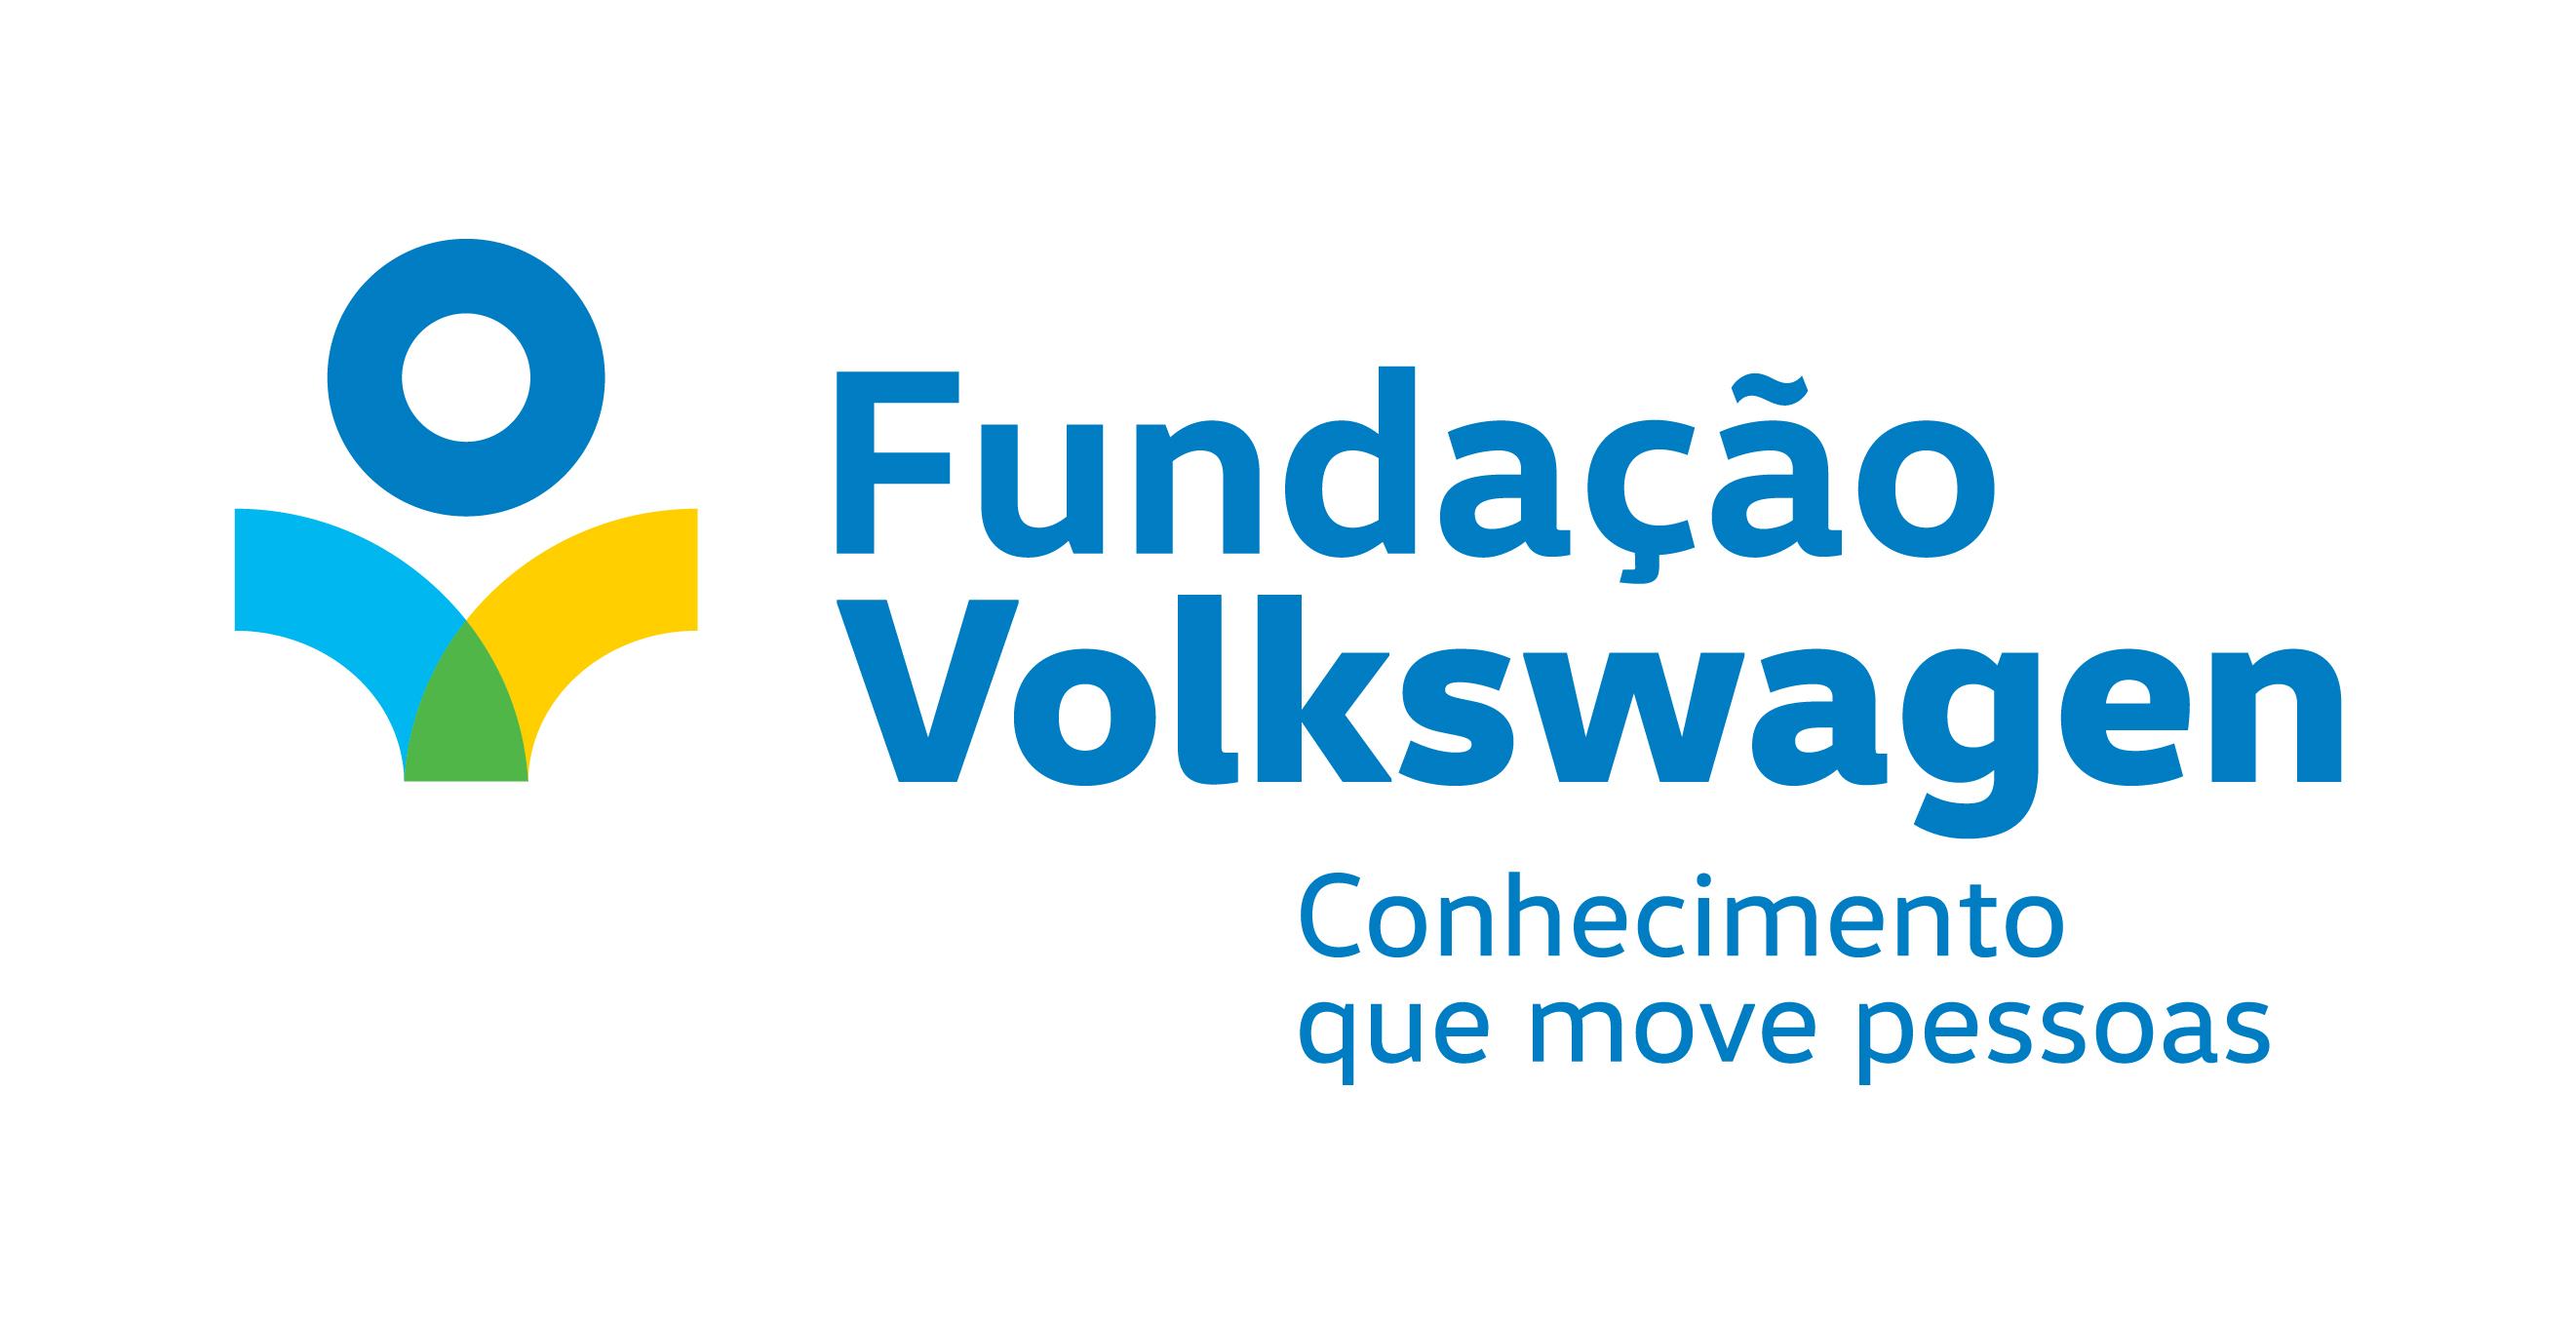 AF_FundacaoVolkswagen_MarcaRGB.jpg